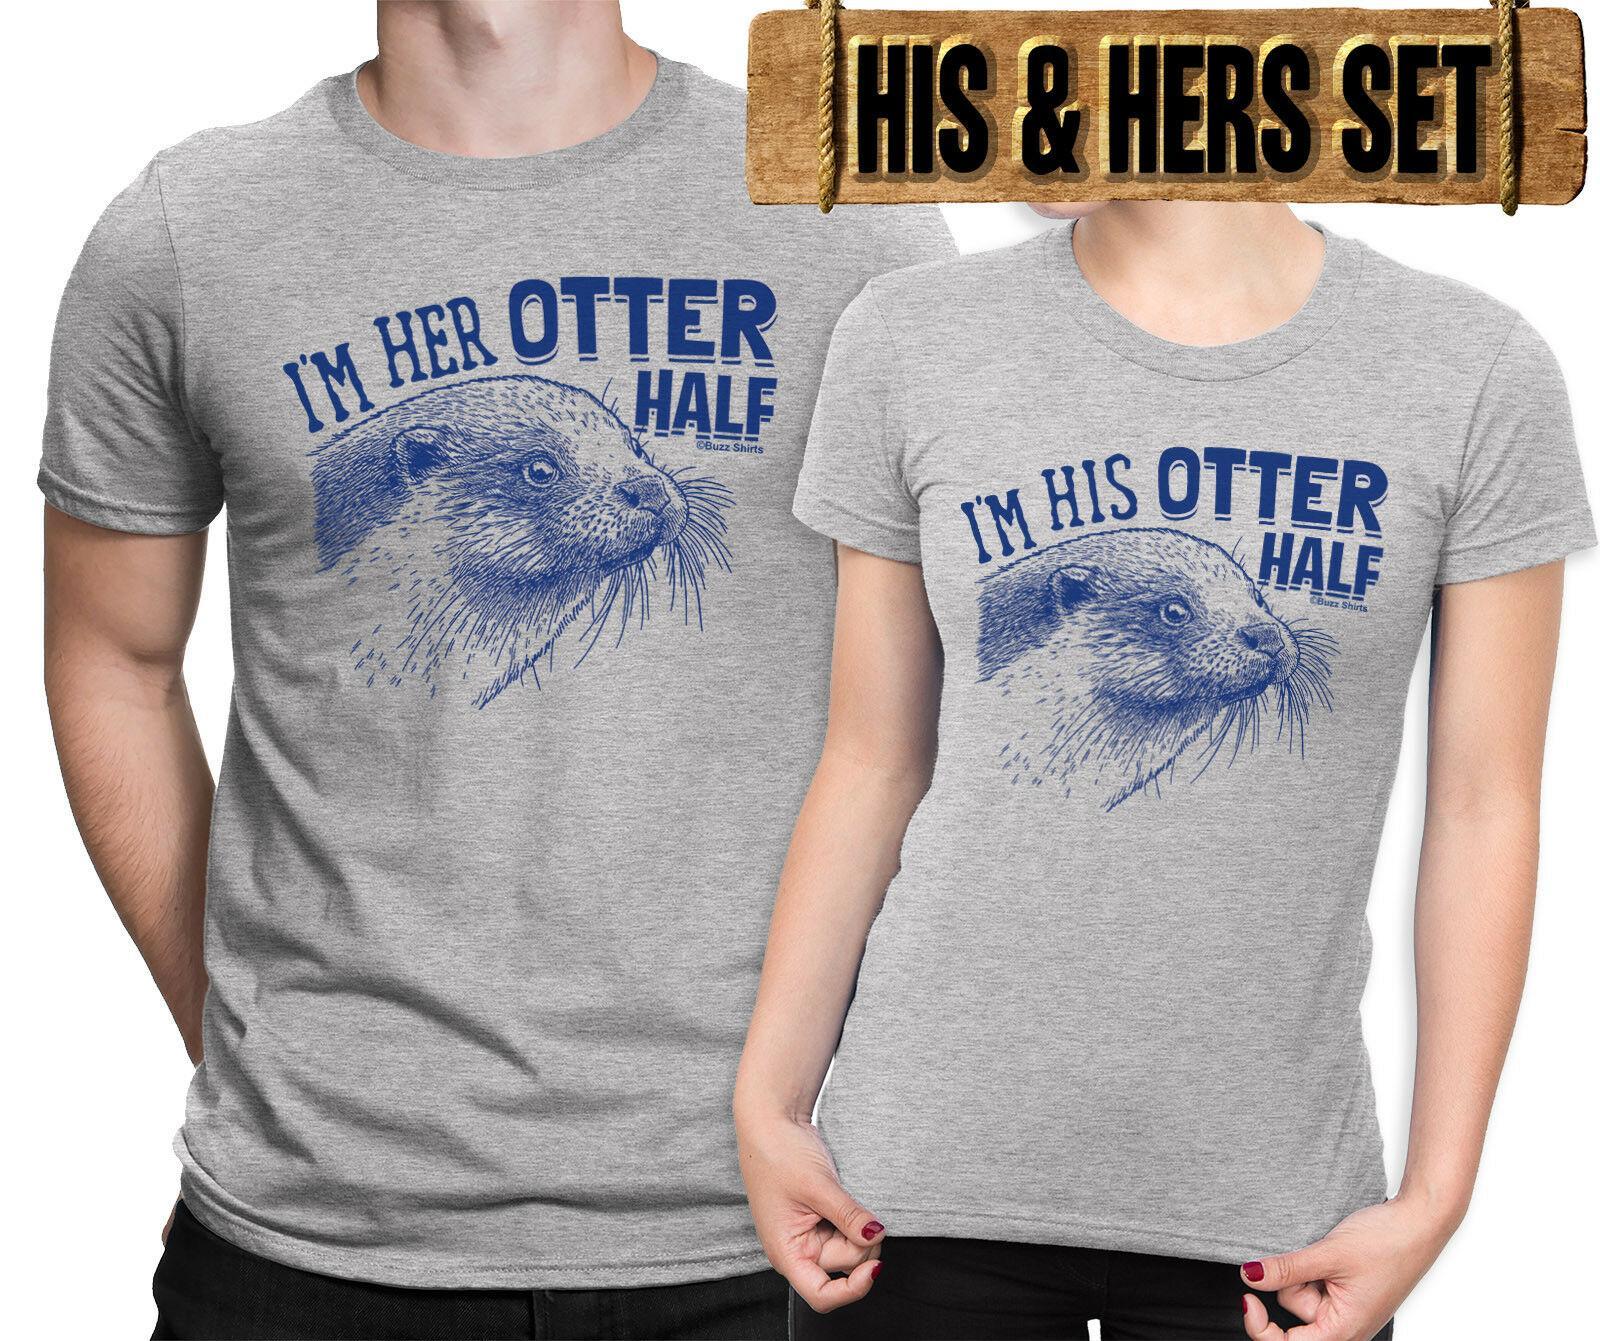 4ccc74994 IM HIS HER OTTER HALF Mens Ladies Matching Couples T Shirt Valentines Day  Men Women Unisex Fashion Tshirt Interesting T Shirt Designs T Shirts Cool  Designs ...